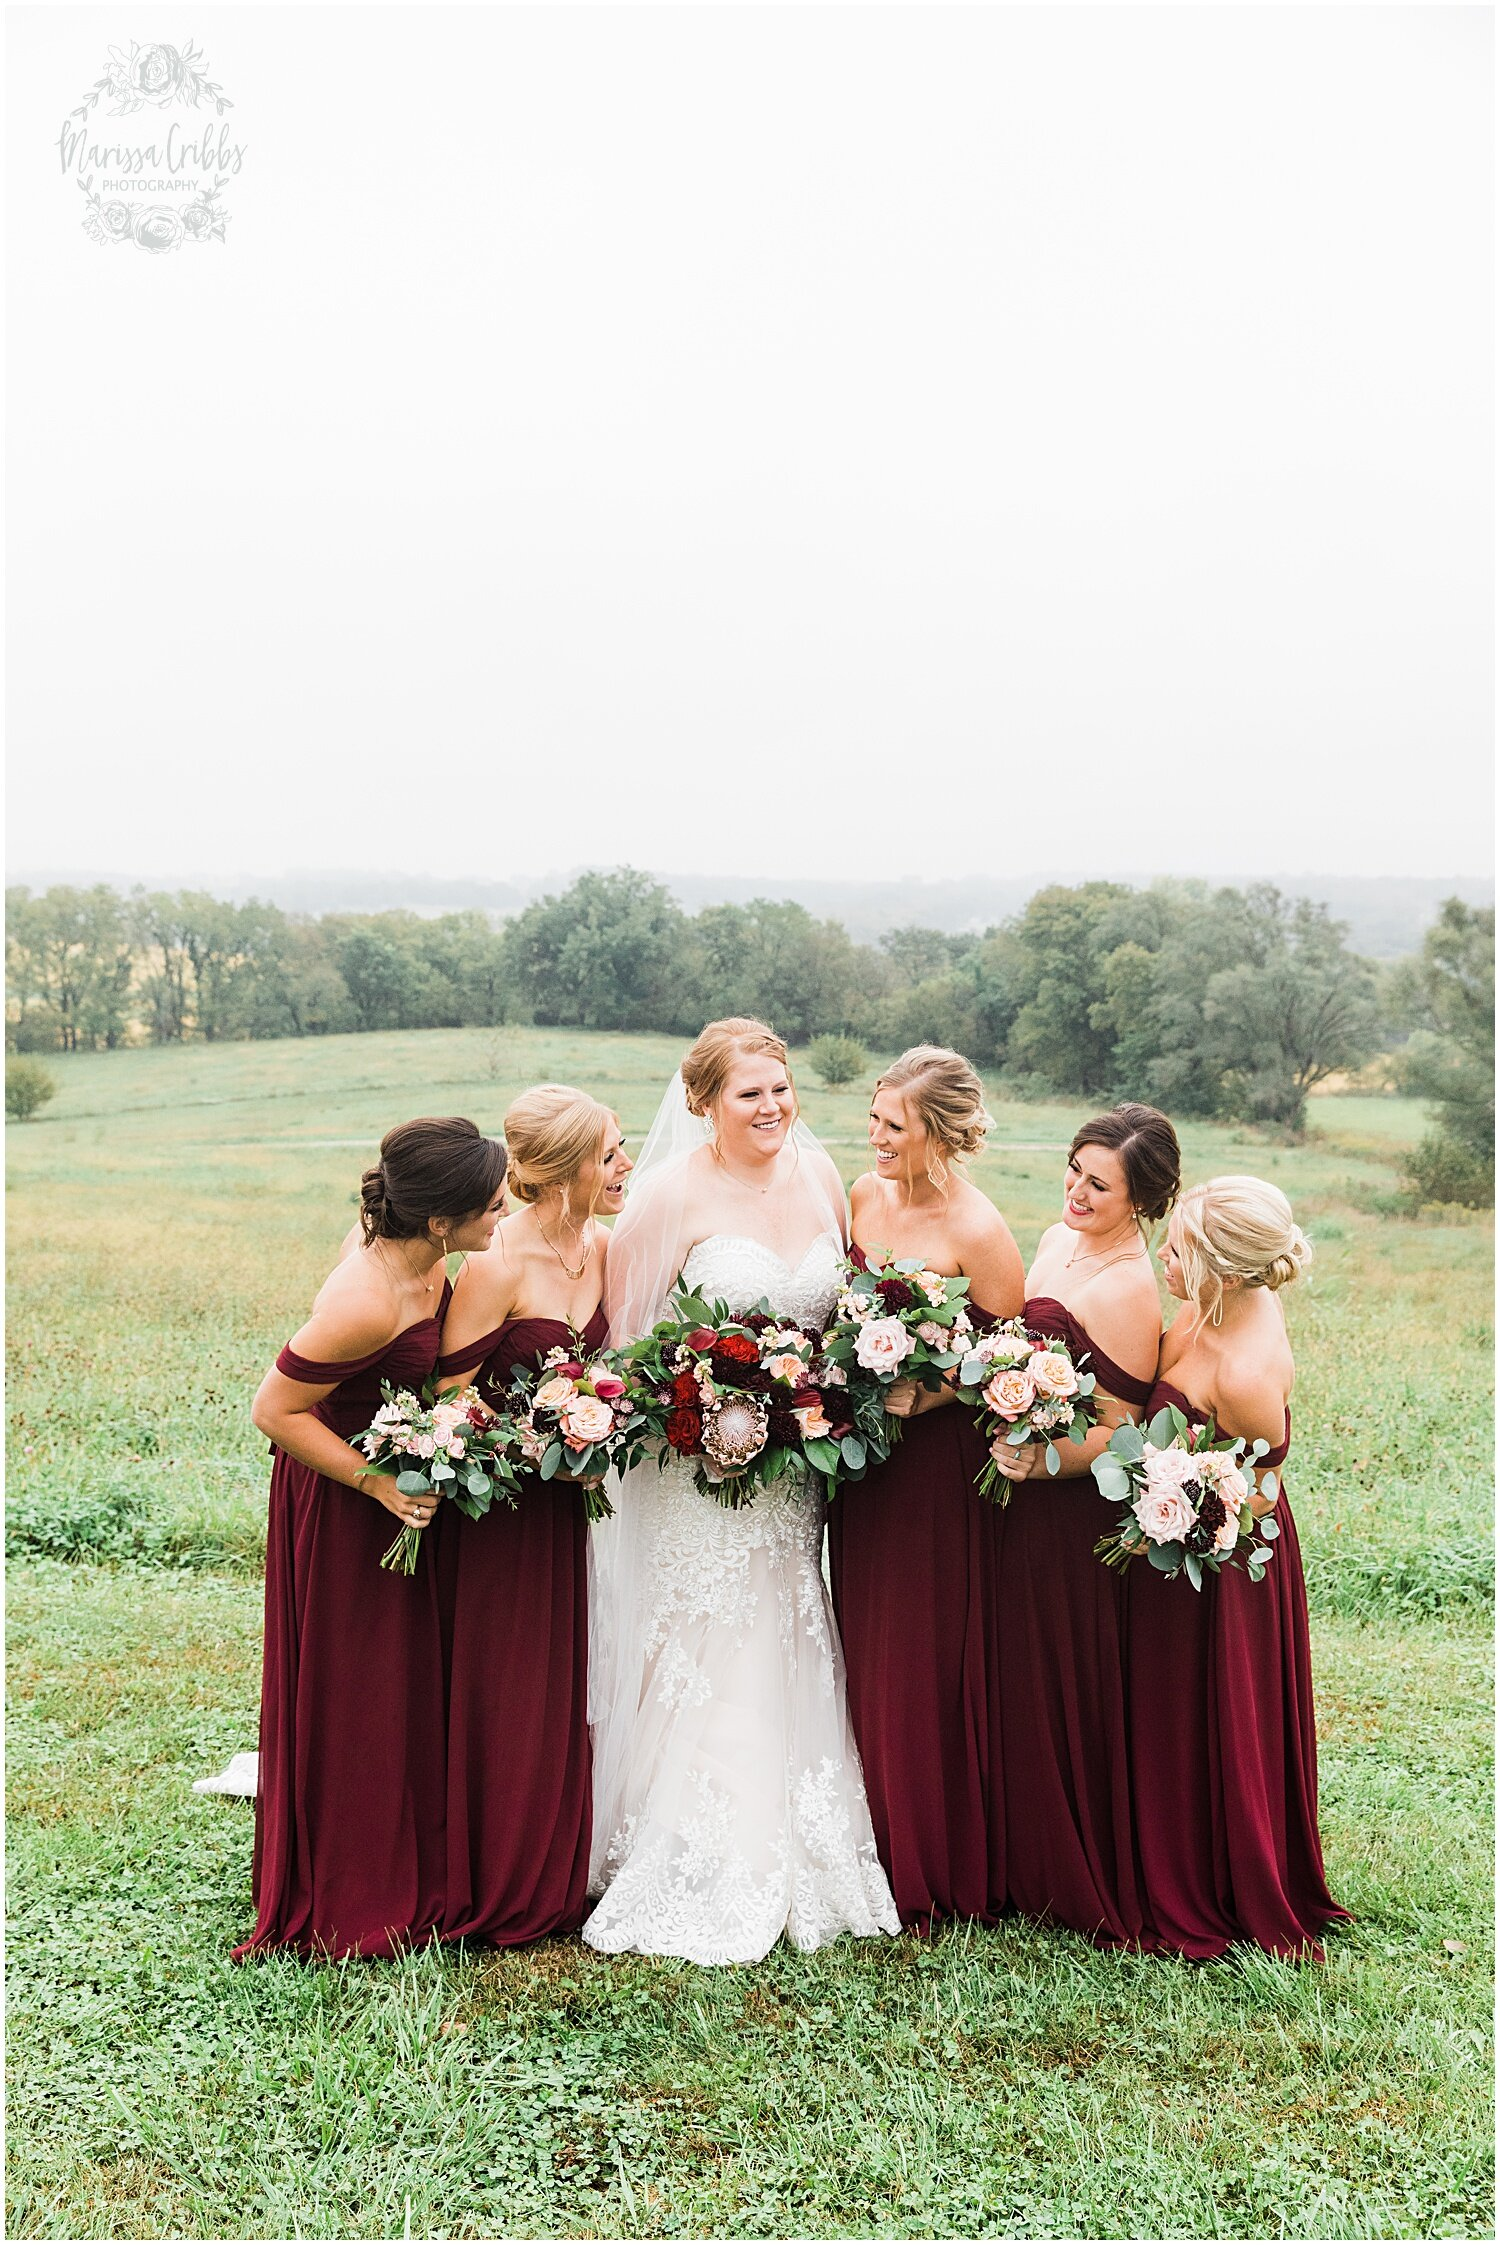 ANNA & LUKE MARRIED BLOG | MARISSA CRIBBS PHOTOGRAPHY | WESTON RED BARN FARM_9416.jpg